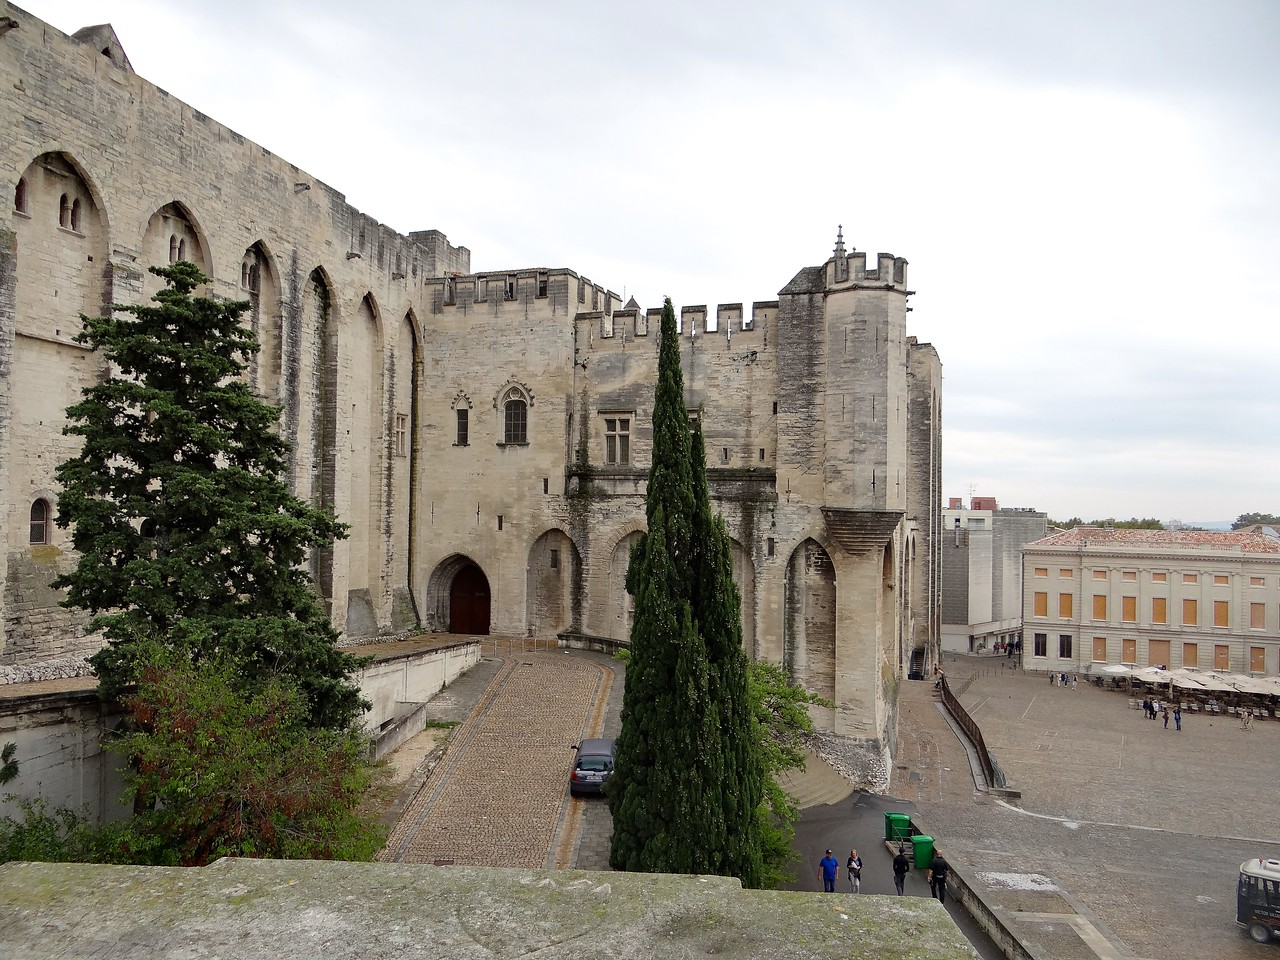 The Vatican of the 1300's in Avignon